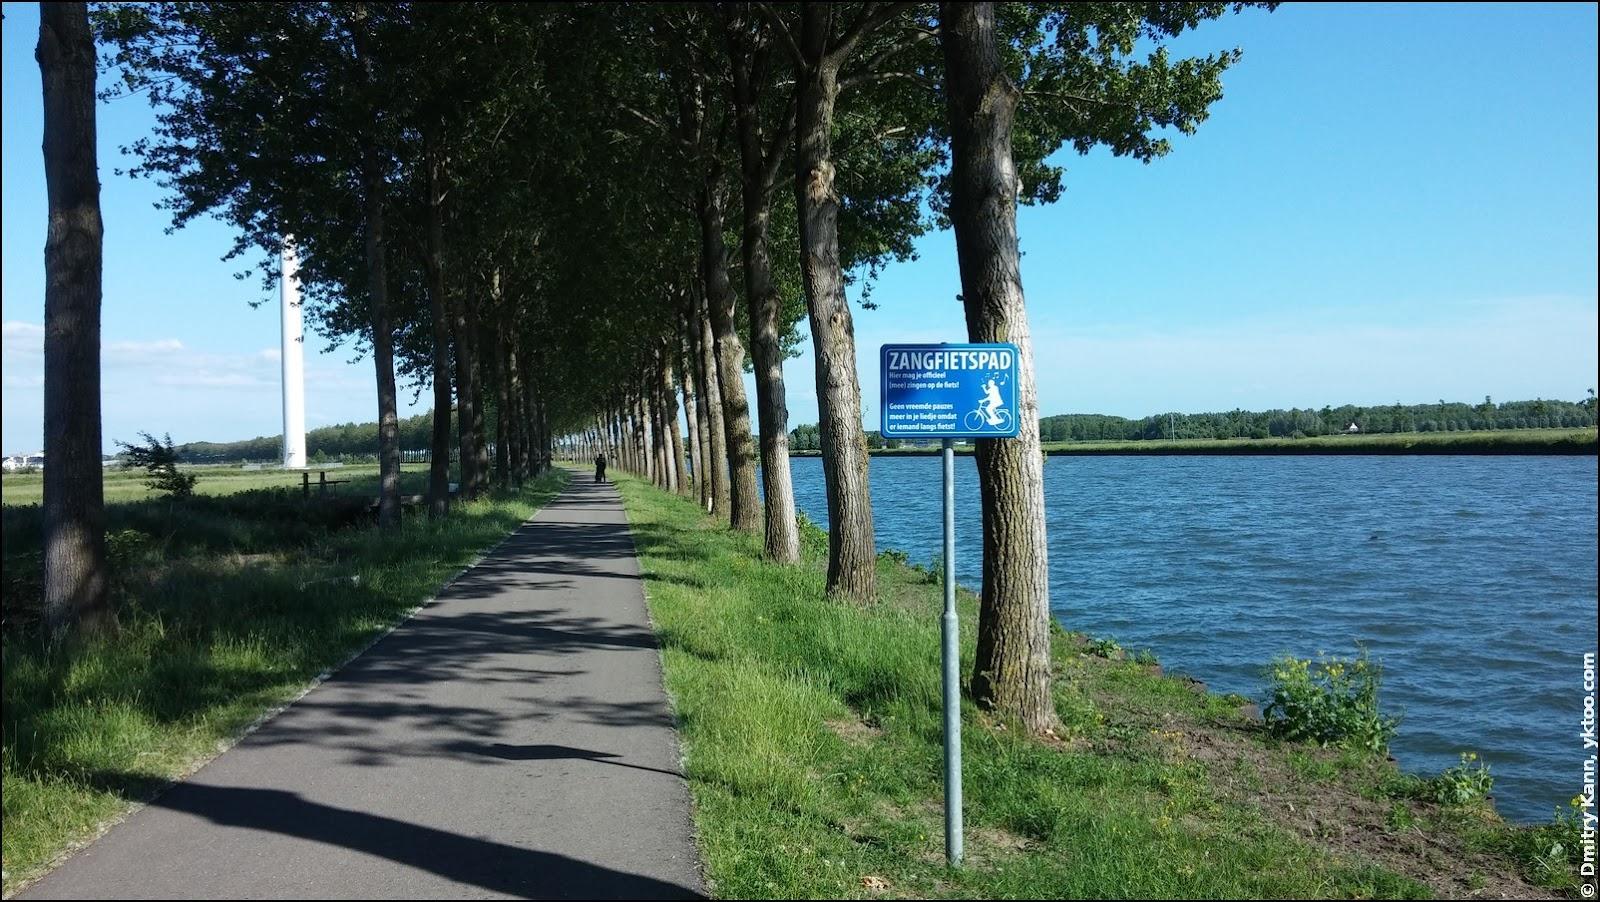 The Amsterdam-Rijnkanaal and the Zangfietspad in June.